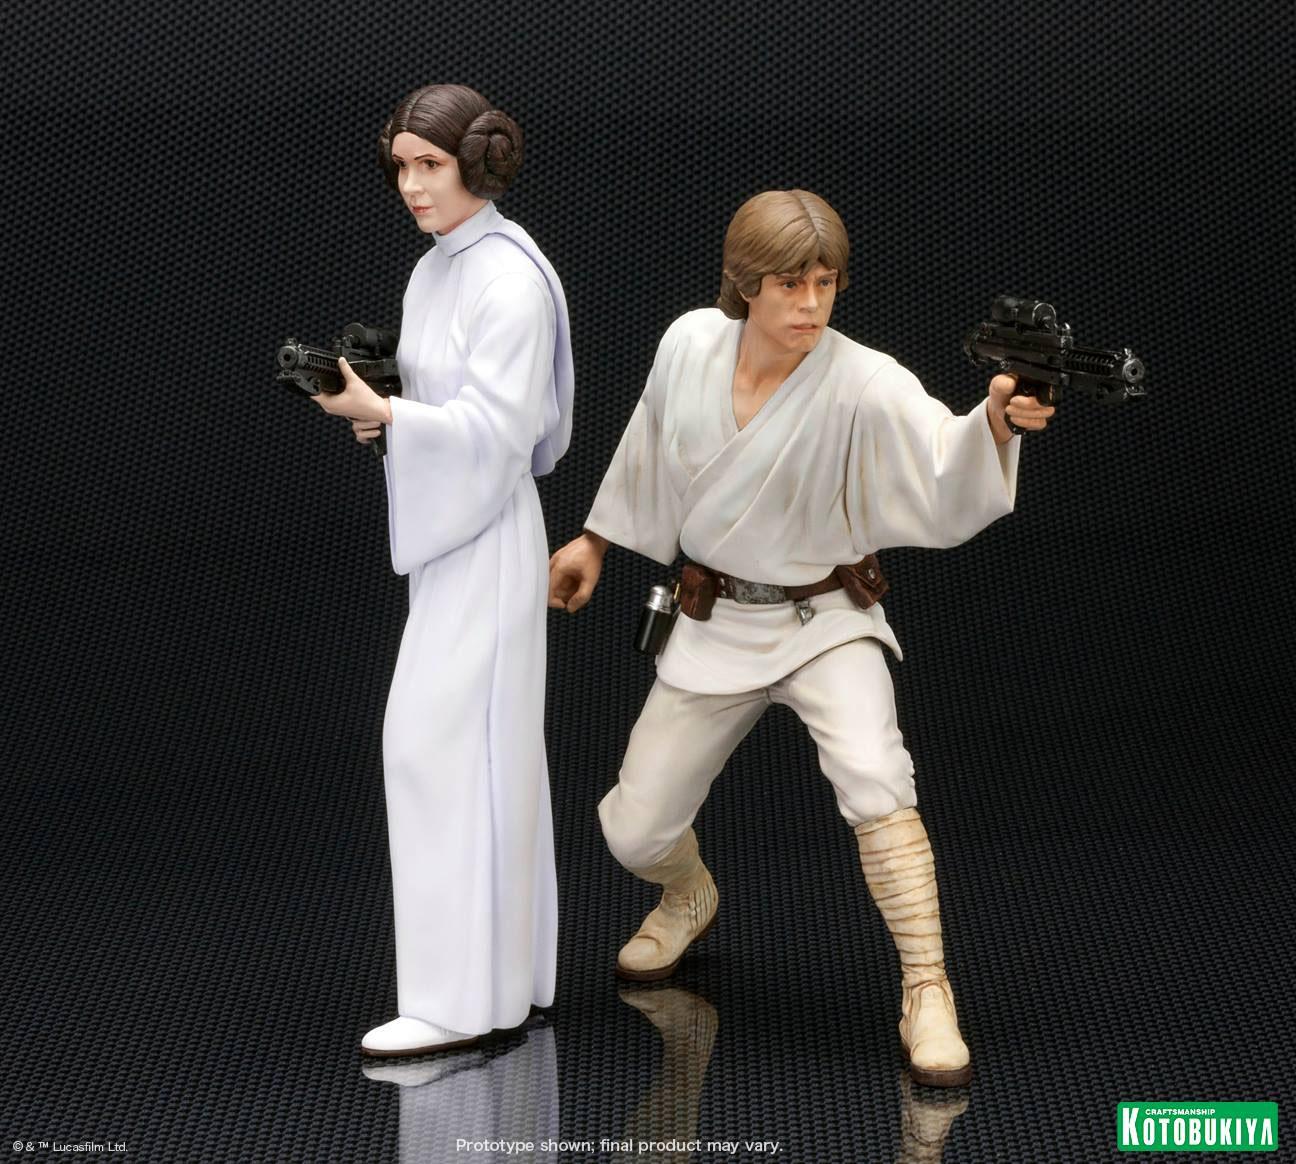 star wars luke skywalker princess leia statuettes pvc artfx 1 10 16 cm kotobukiya ktosw89. Black Bedroom Furniture Sets. Home Design Ideas